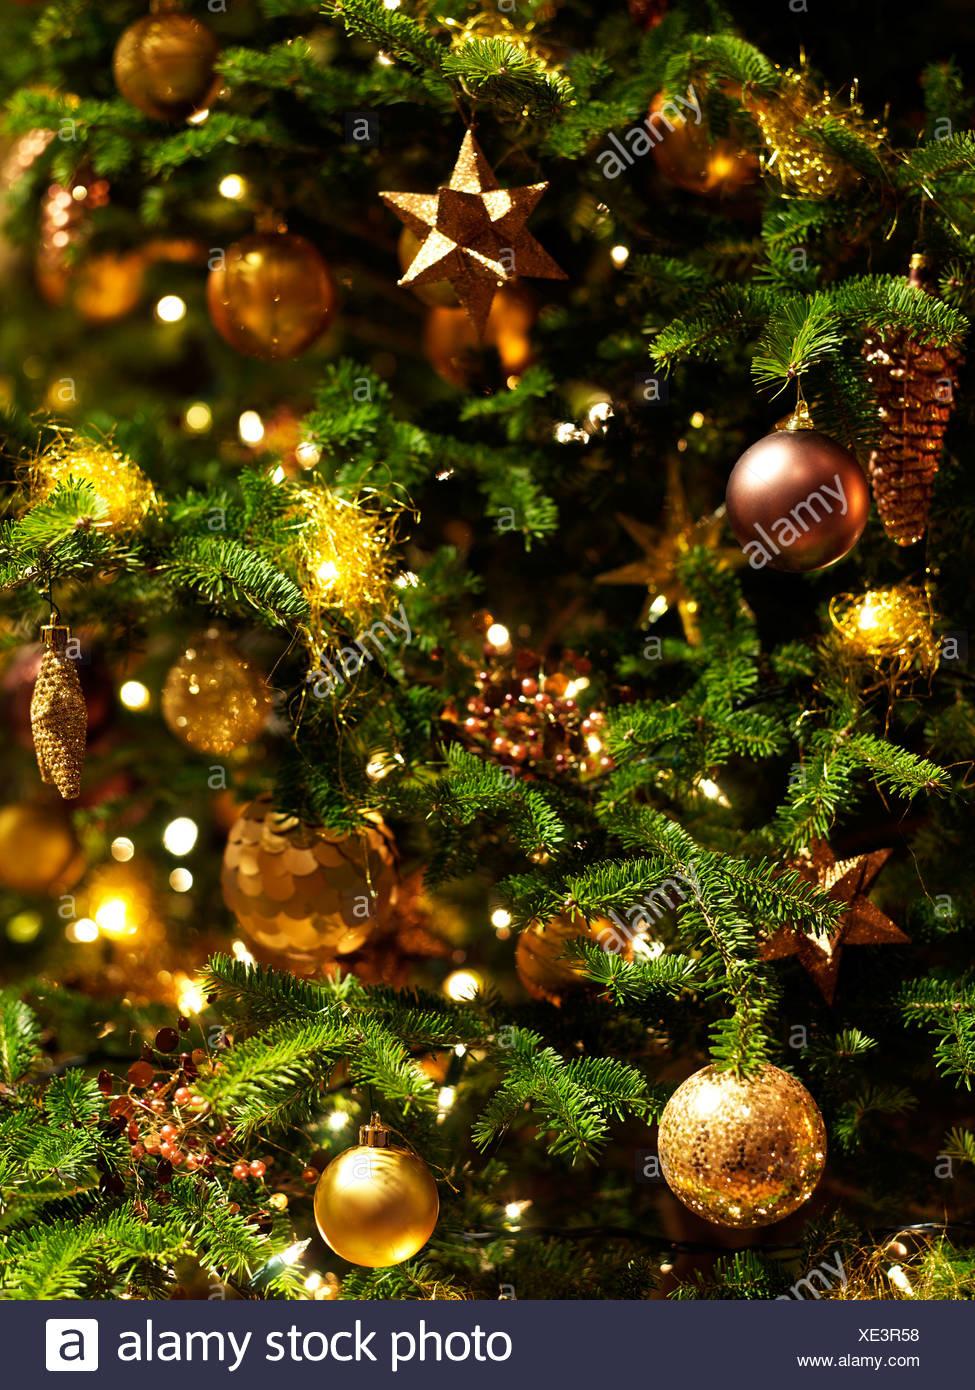 Christmas Tree Decorations Stock Photo Alamy